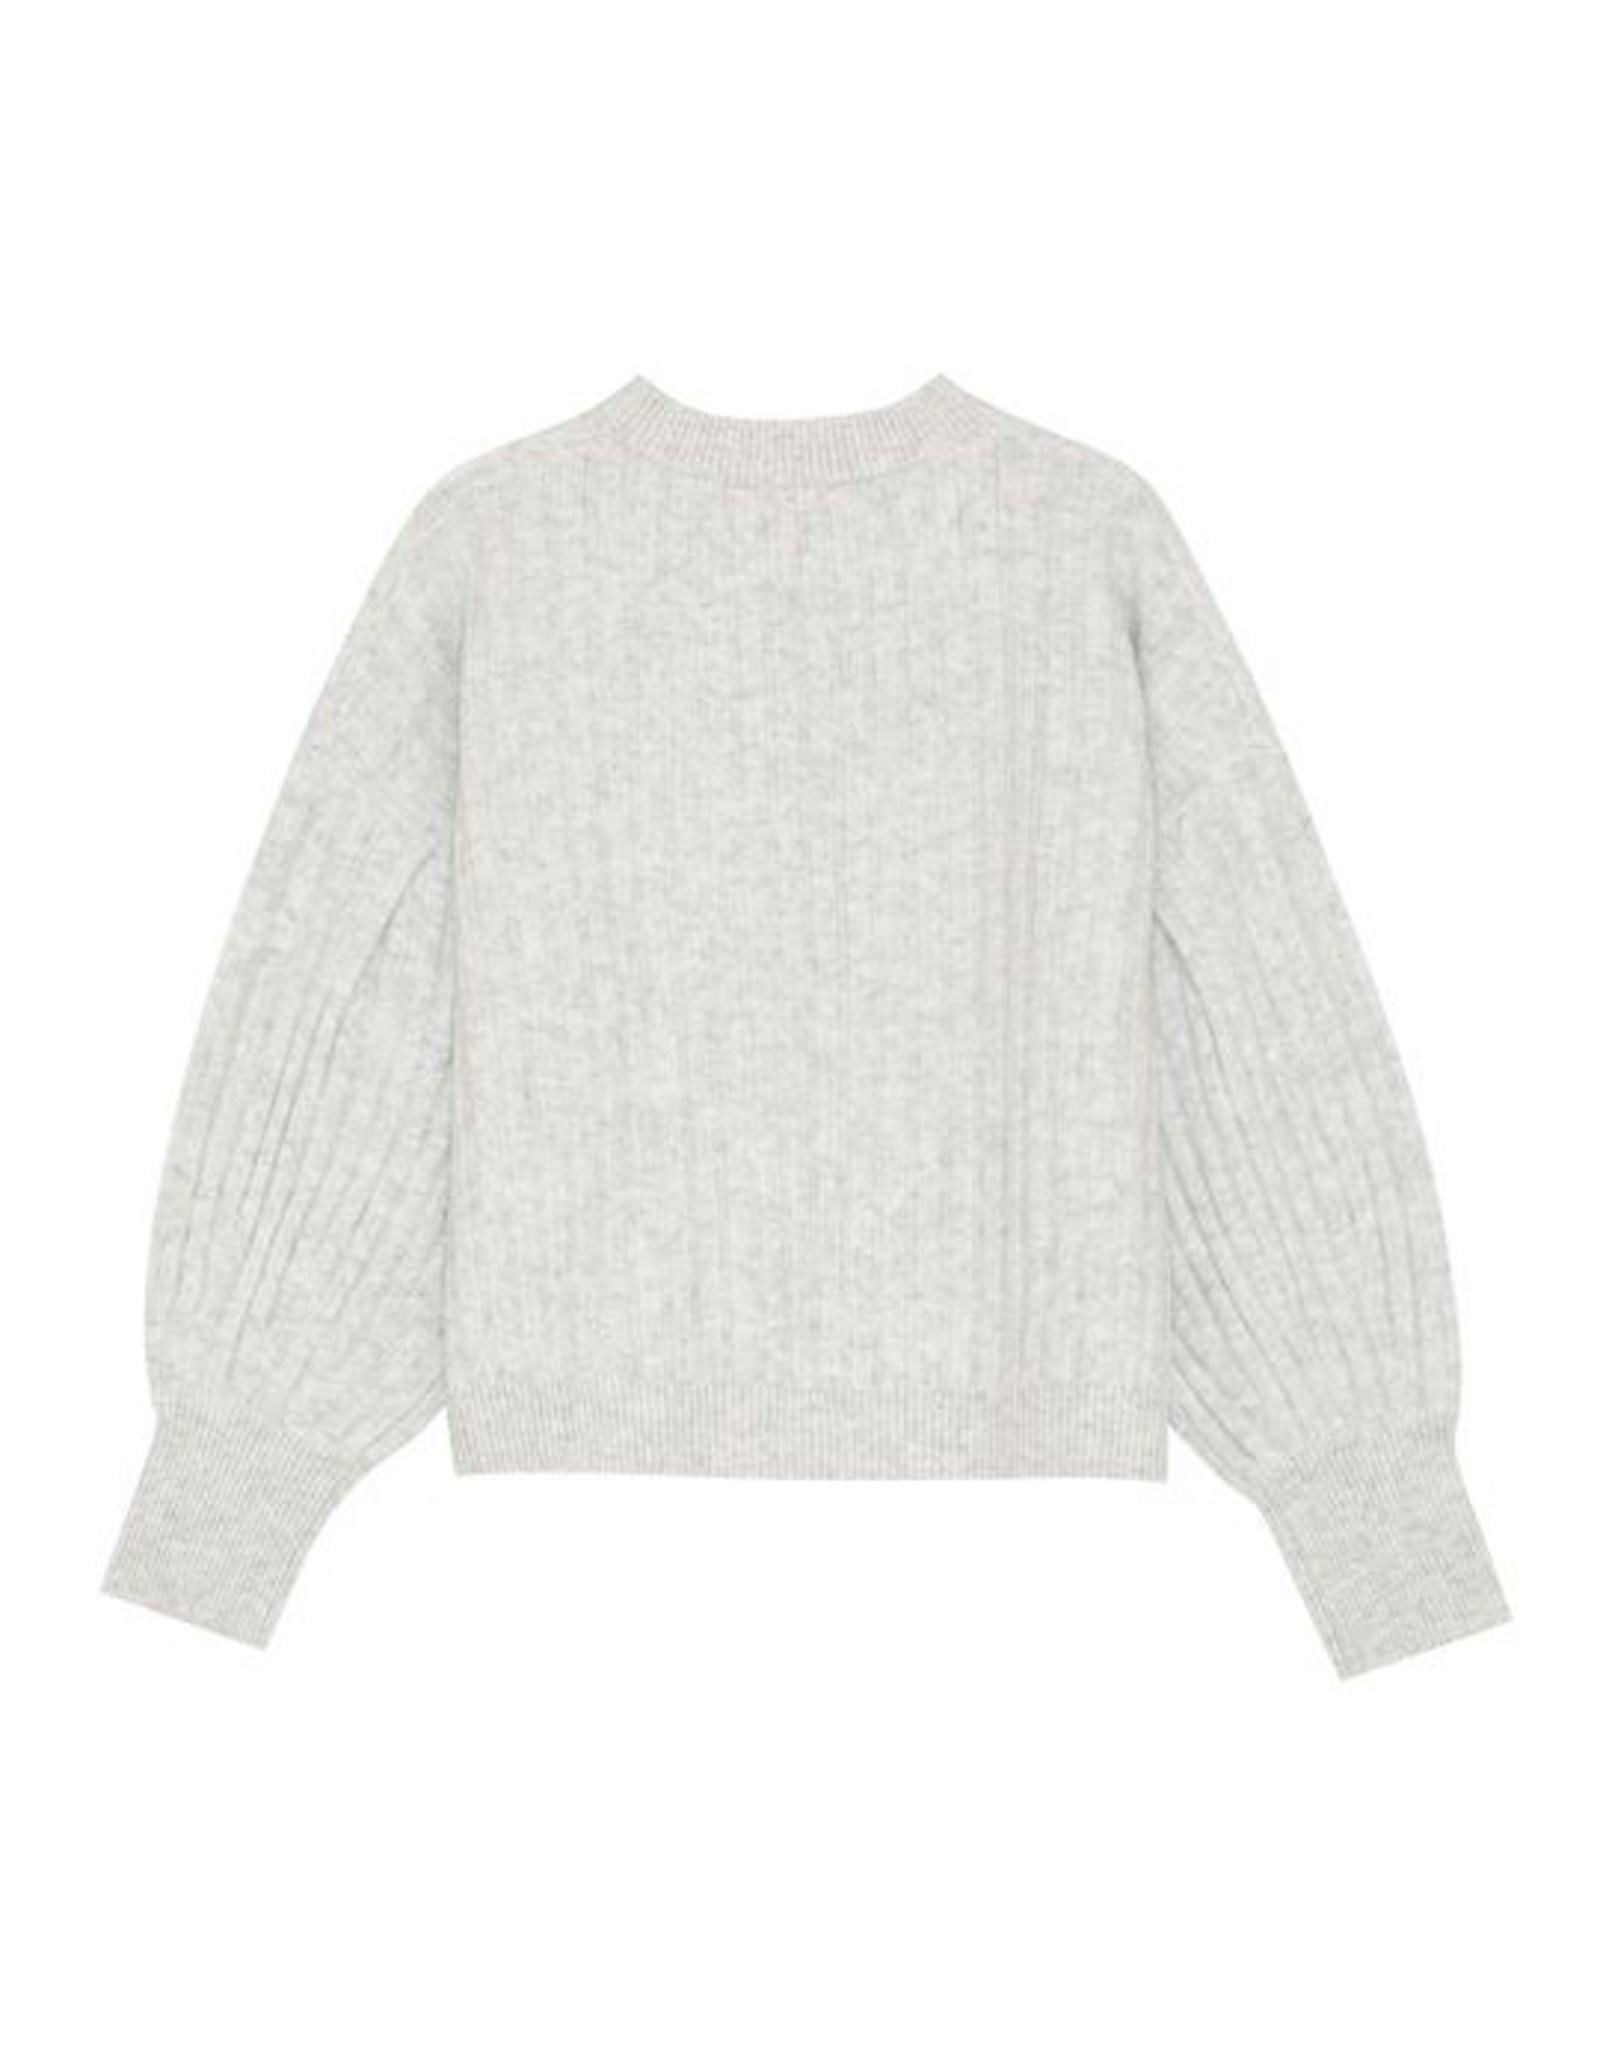 Grace & Mila Bambou Knit Sweater